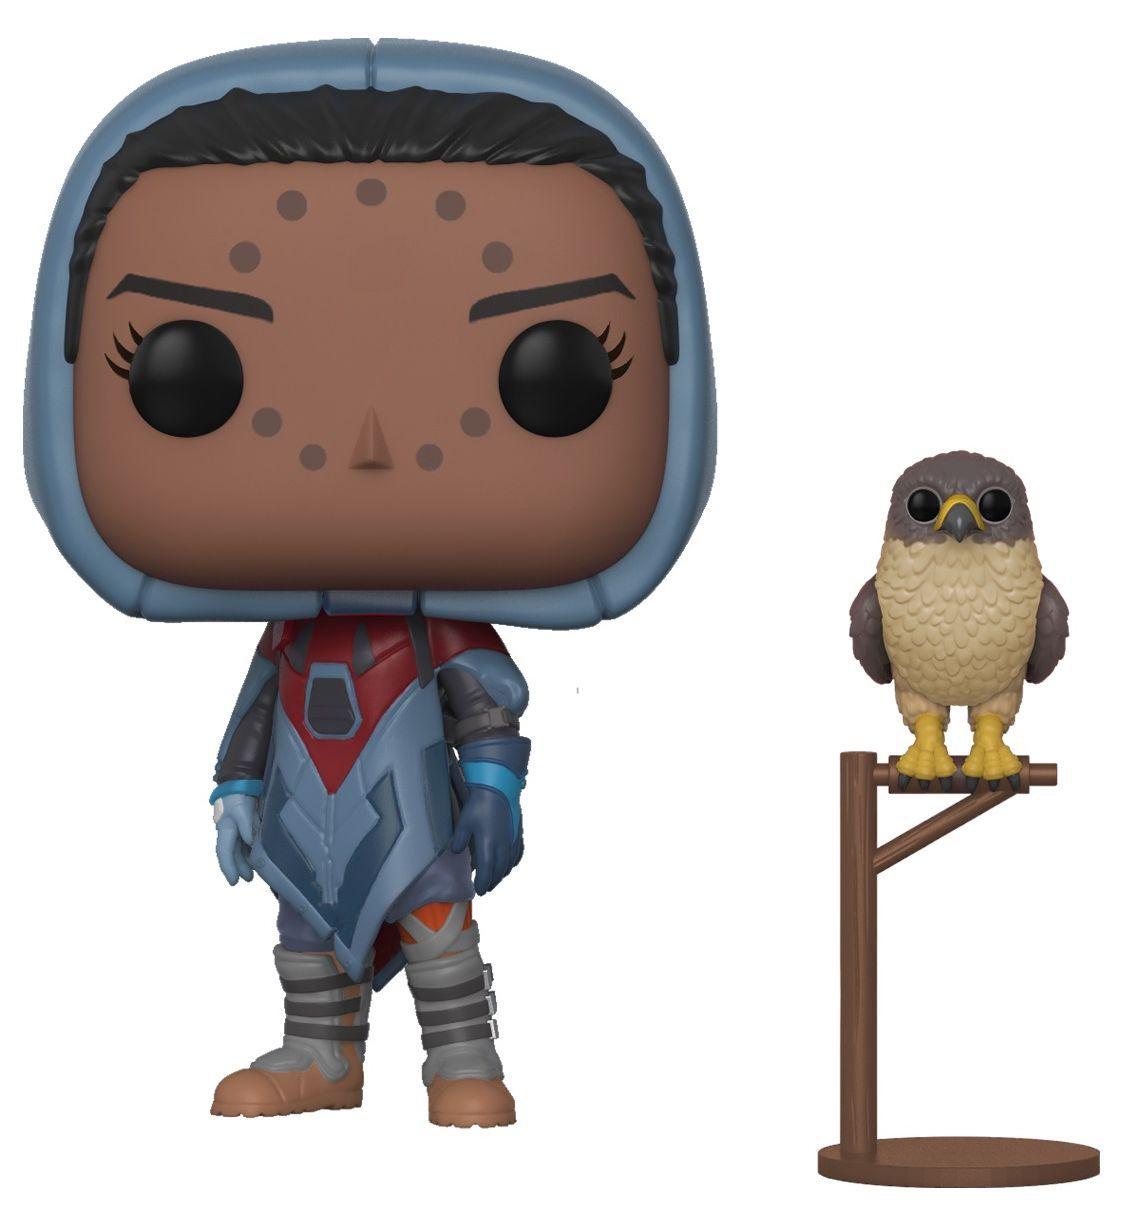 Фигура Funko Pop! Games: Destiny - Hawthorne with Hawk, #337 - 1